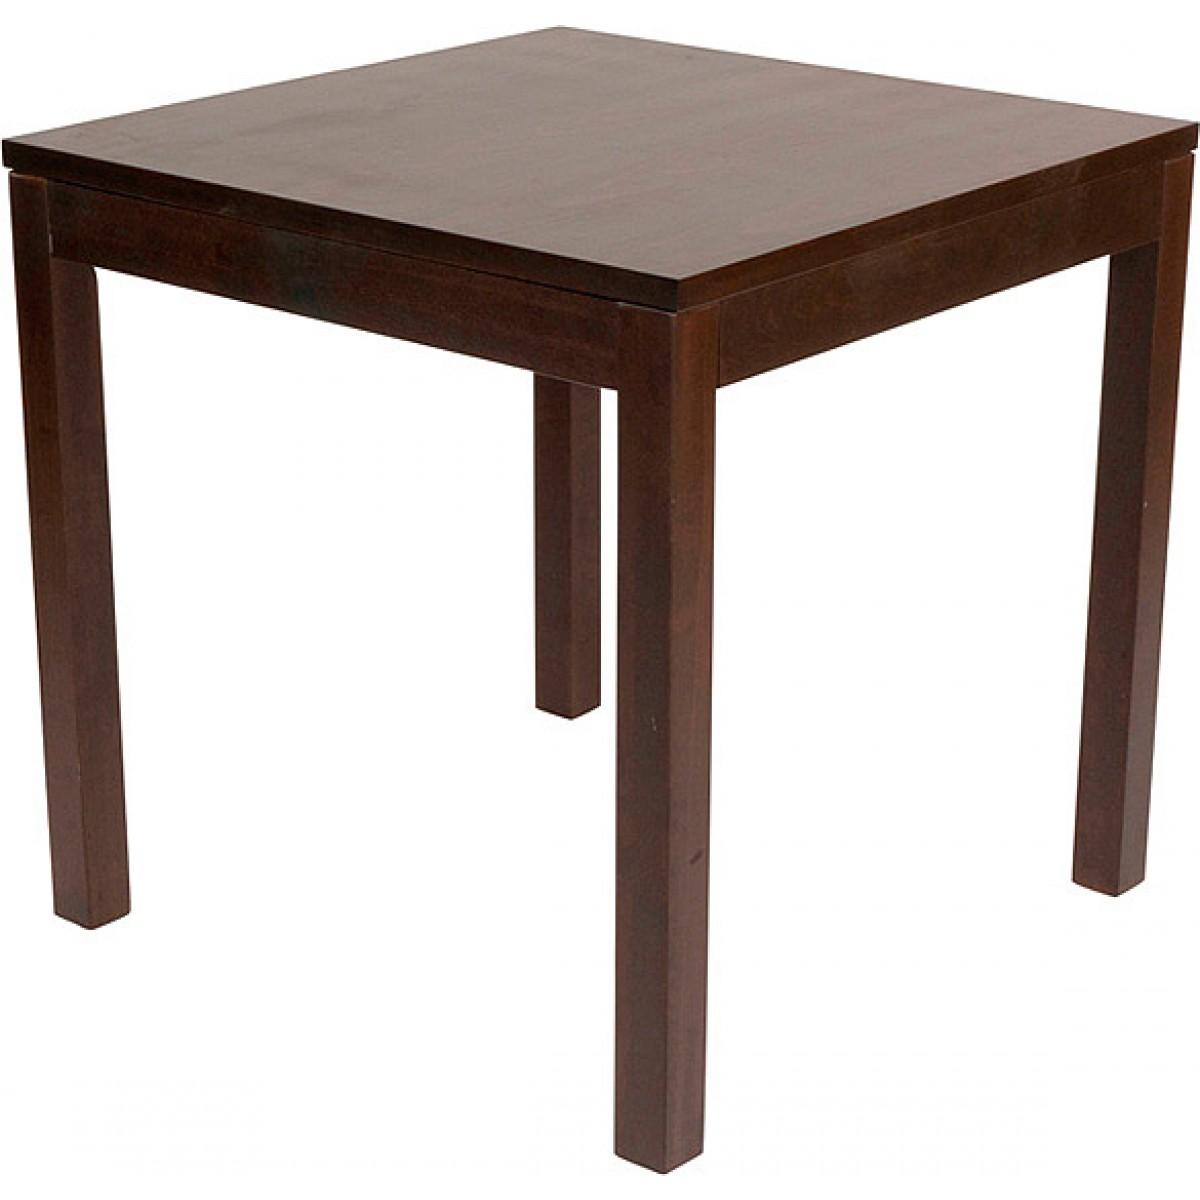 Sidmouth 90cm Diameter Cork Bar Furniture : Sidmouth 76cm x 76cm from www.corkbarfurniture.ie size 1200 x 1200 jpeg 109kB